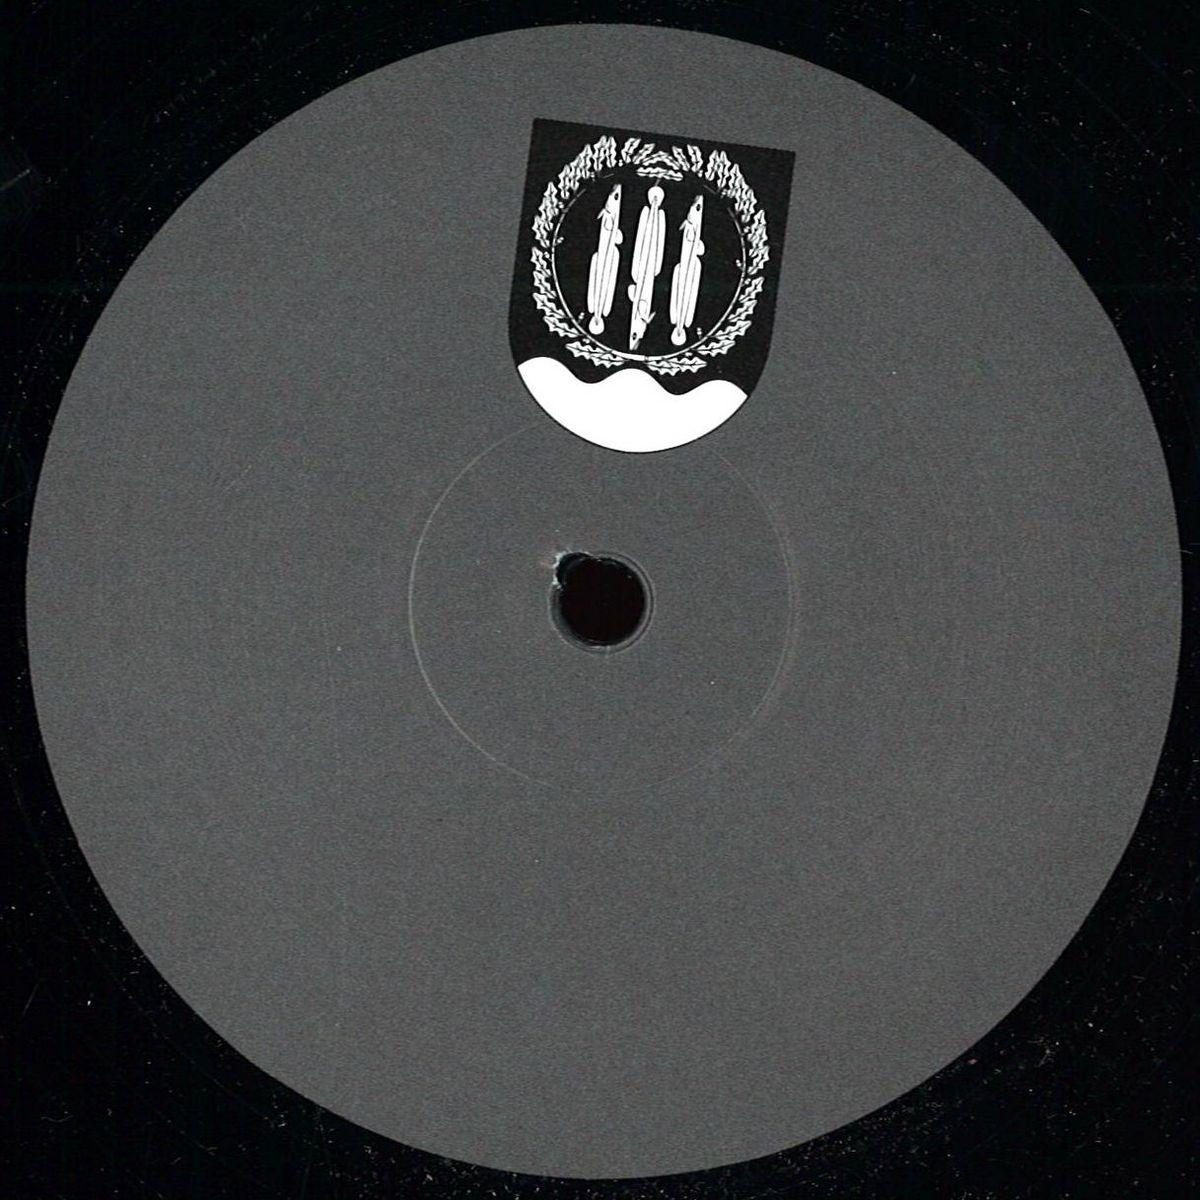 Tiago Walter - Polyphone Ringtone EP (Sturo)